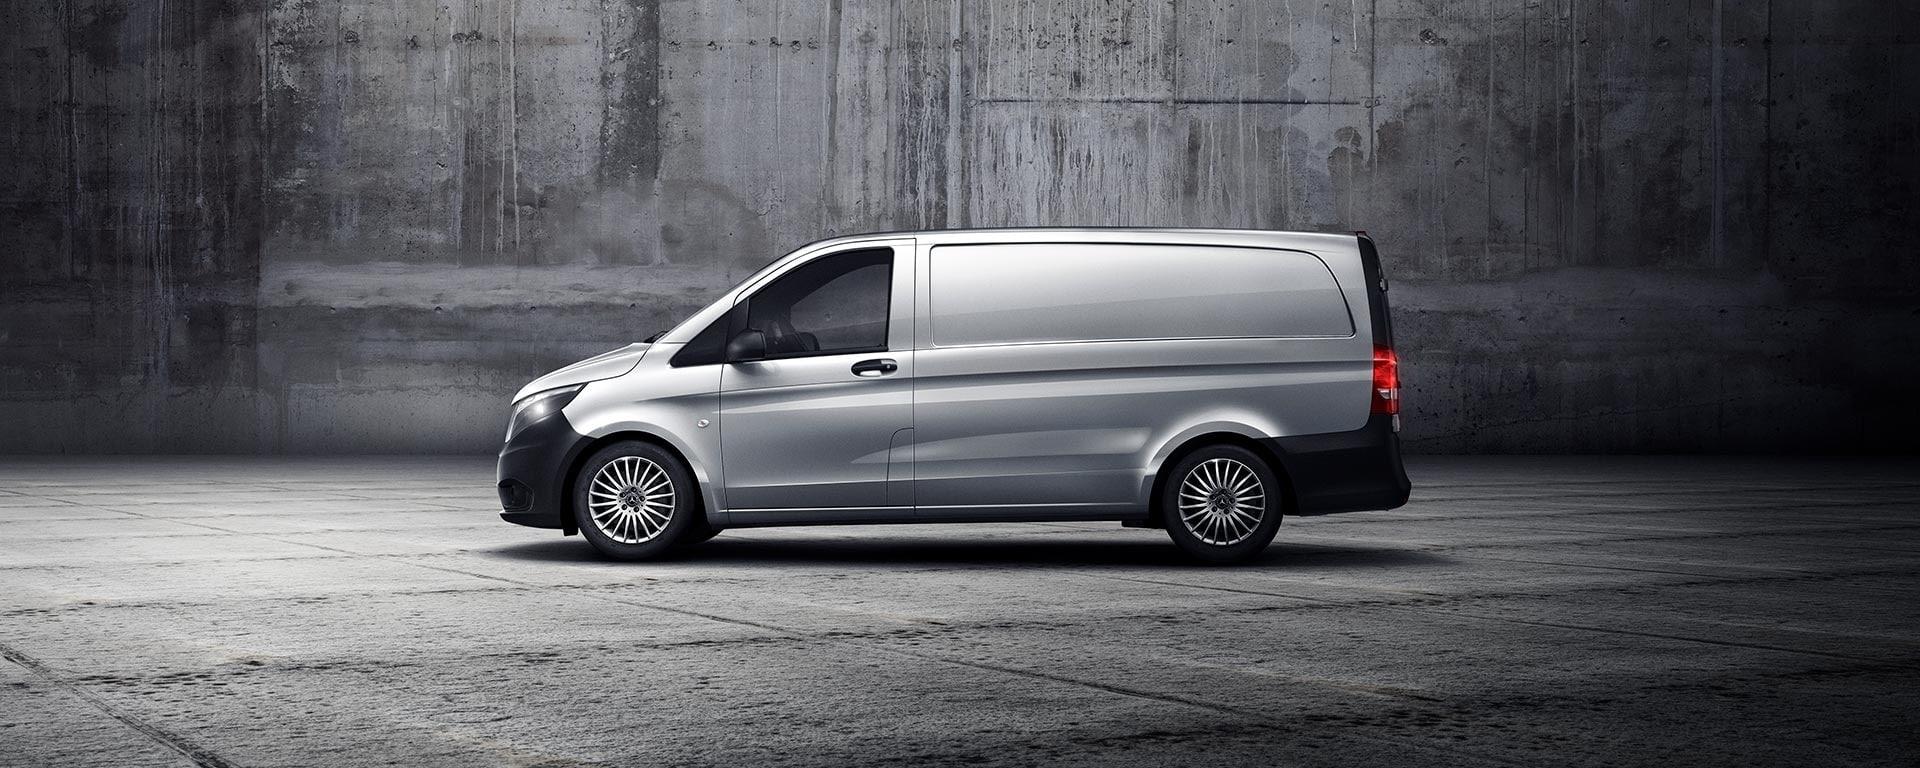 Smalandska-Bil-Mercedes-Benz-Vito-kampanj